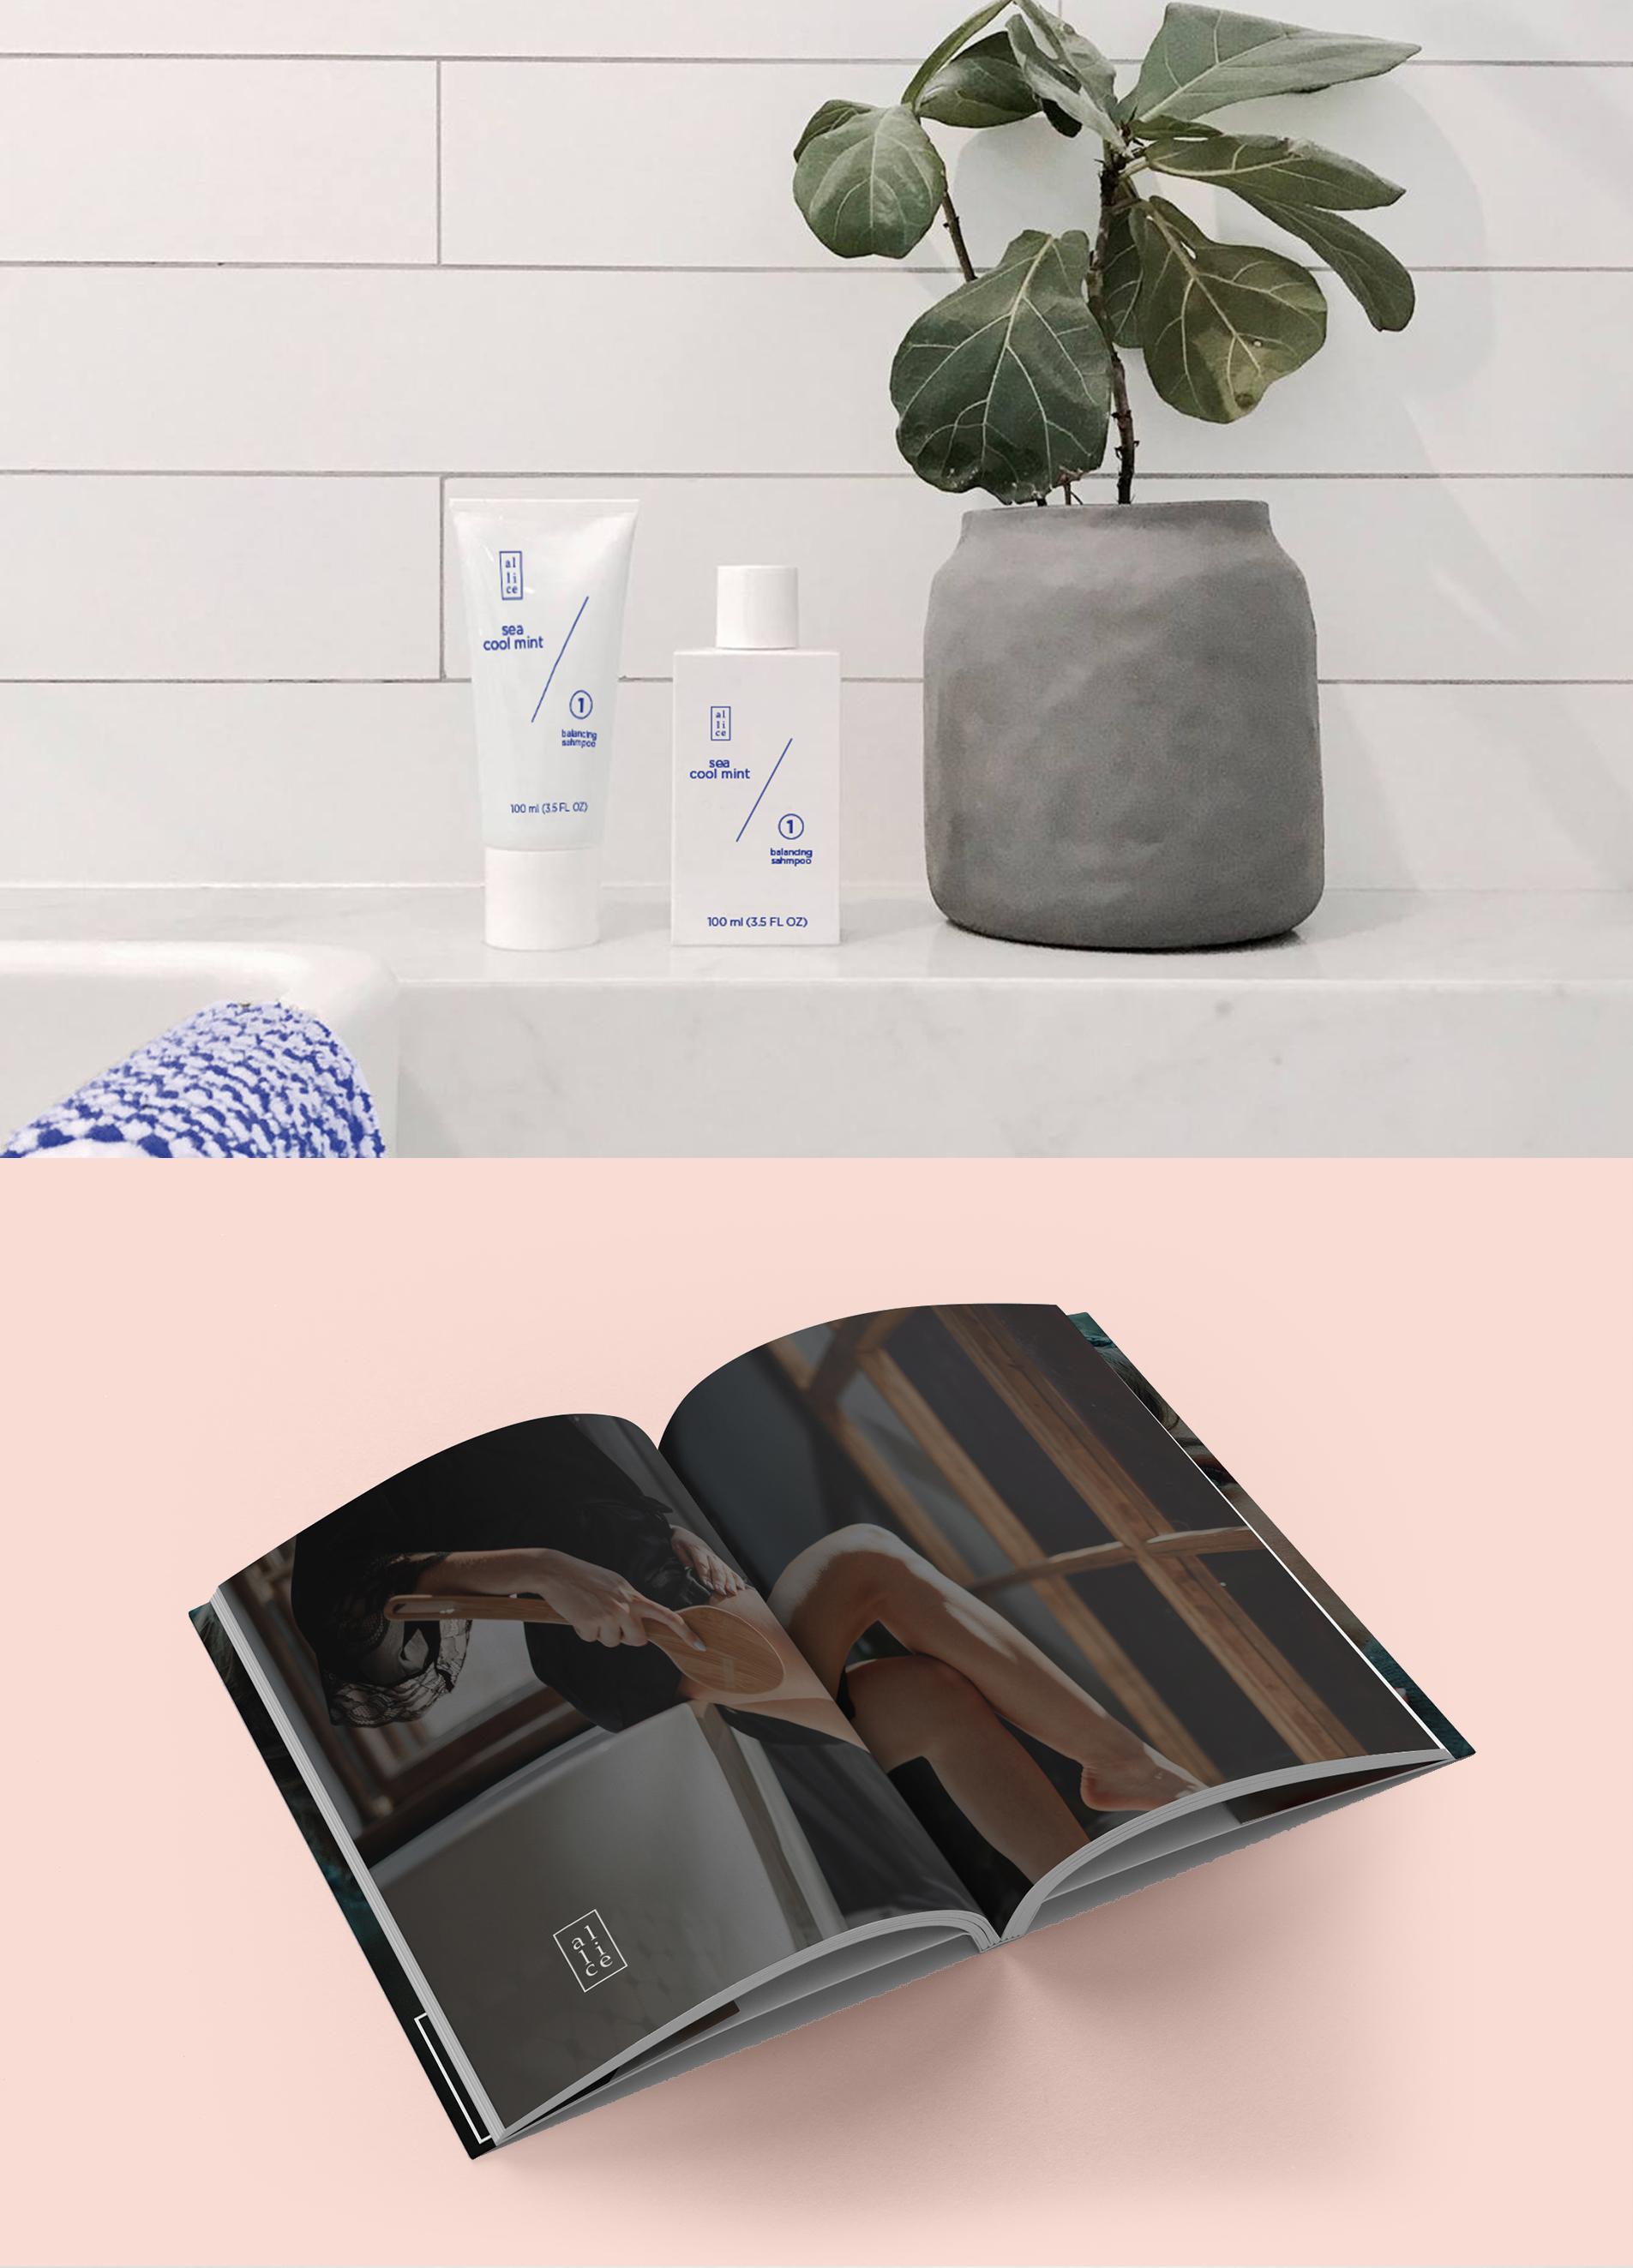 https://www.behance.net/andonov Web design for cosmetic brand